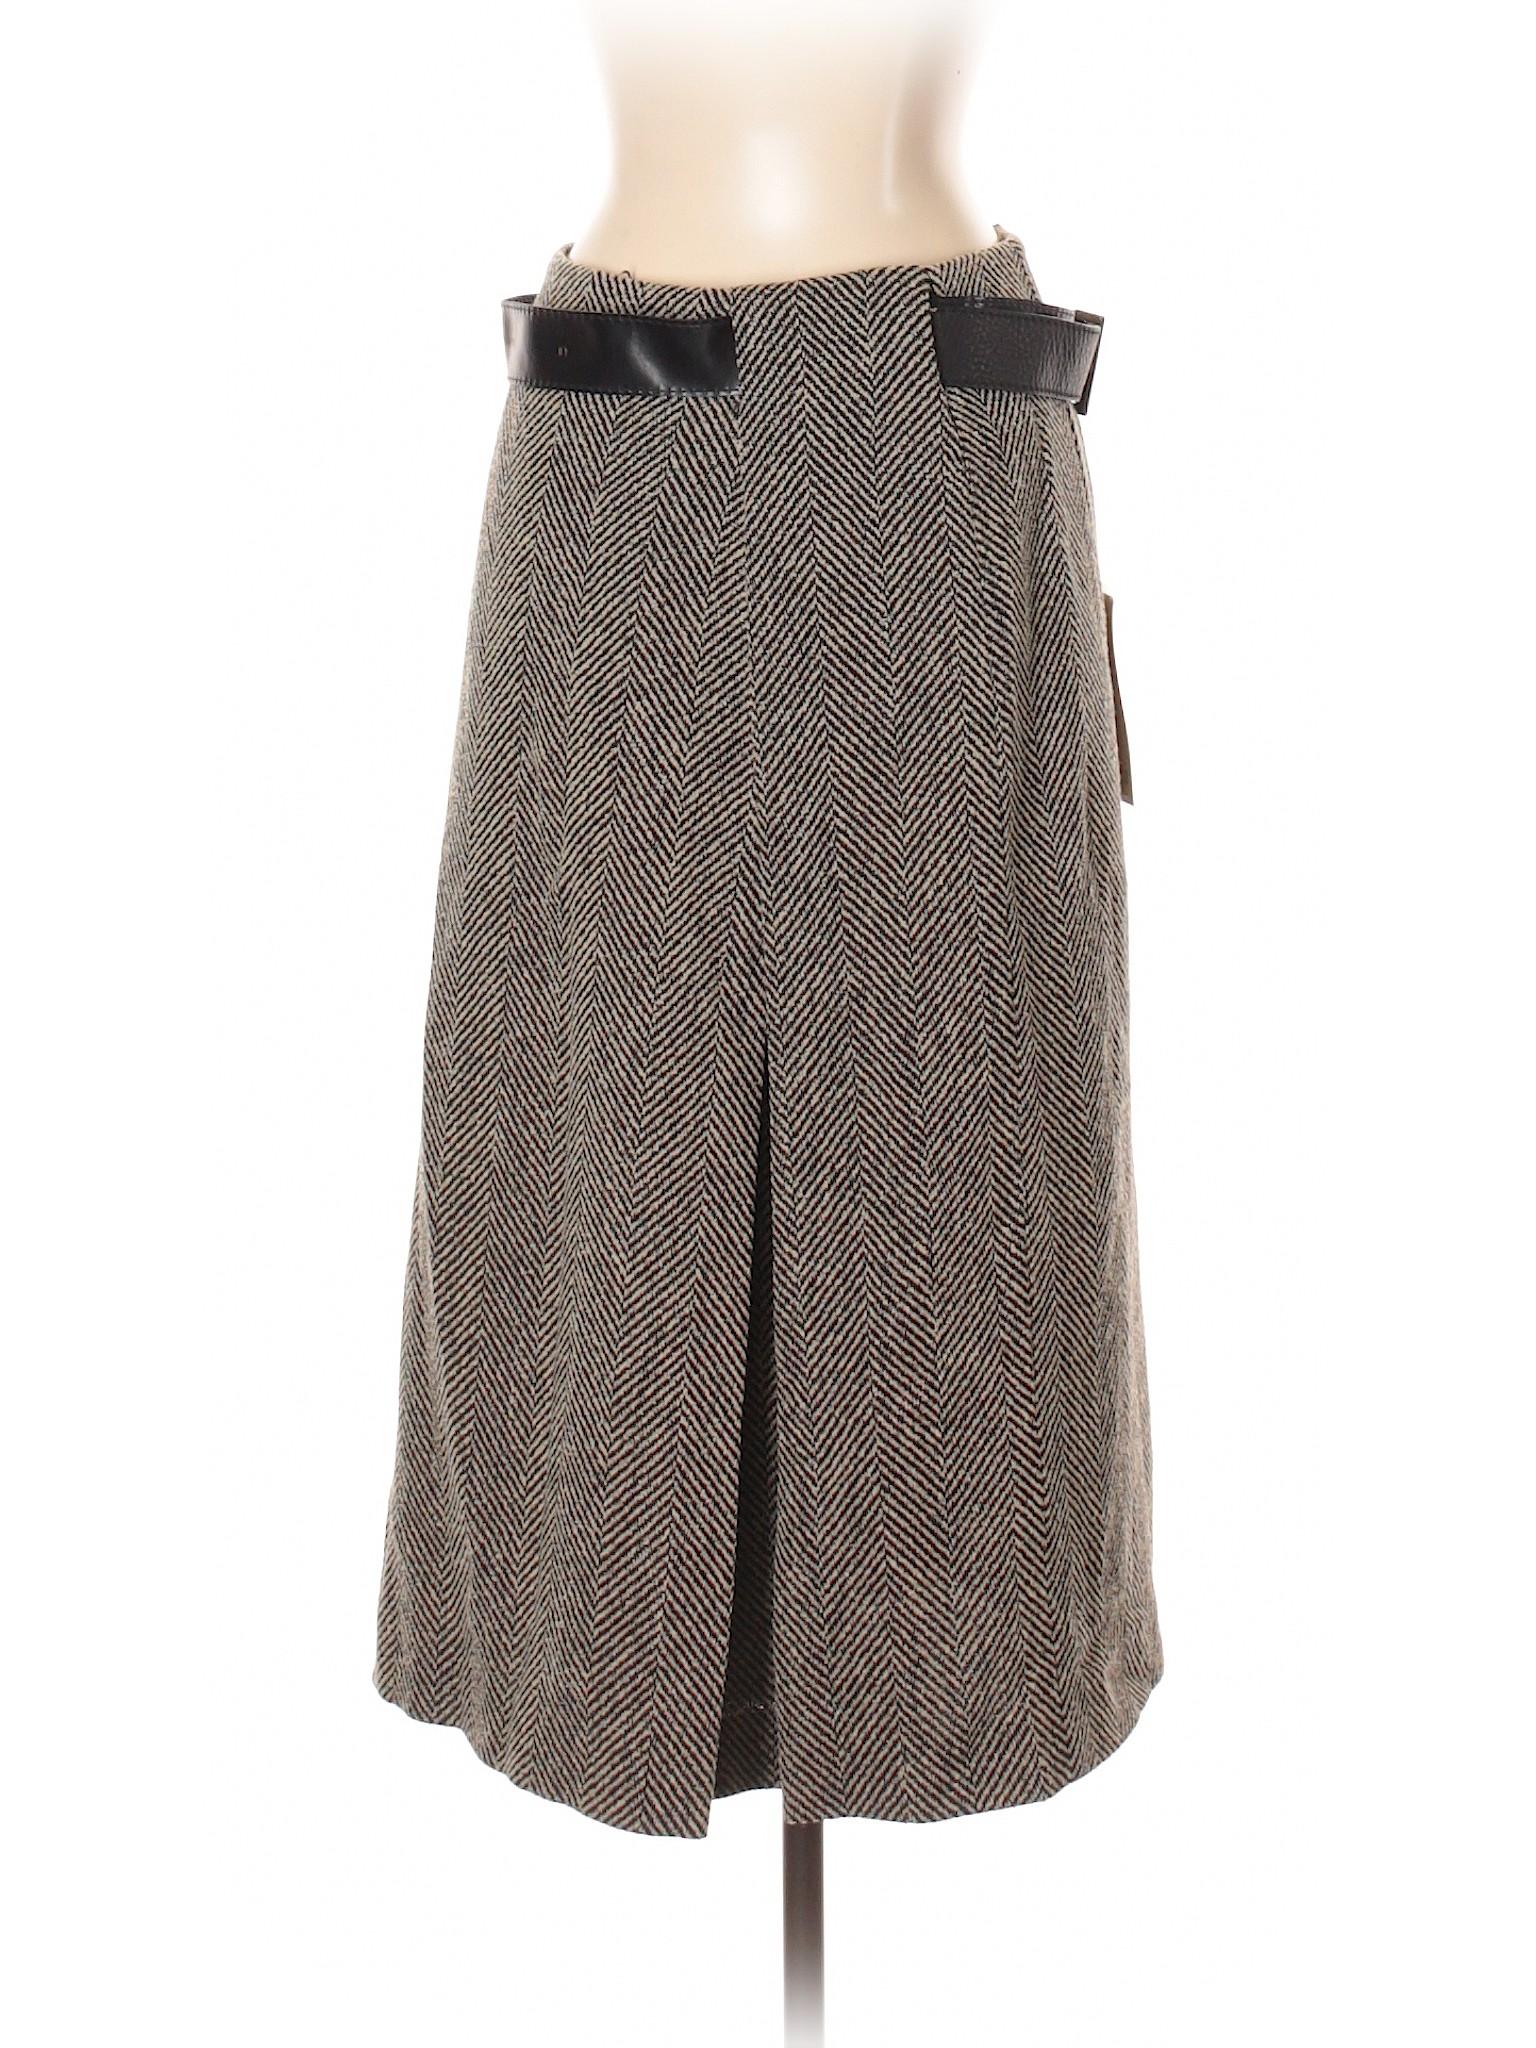 Skirt winter Wool Leisure Max Mara xIw4nZRq